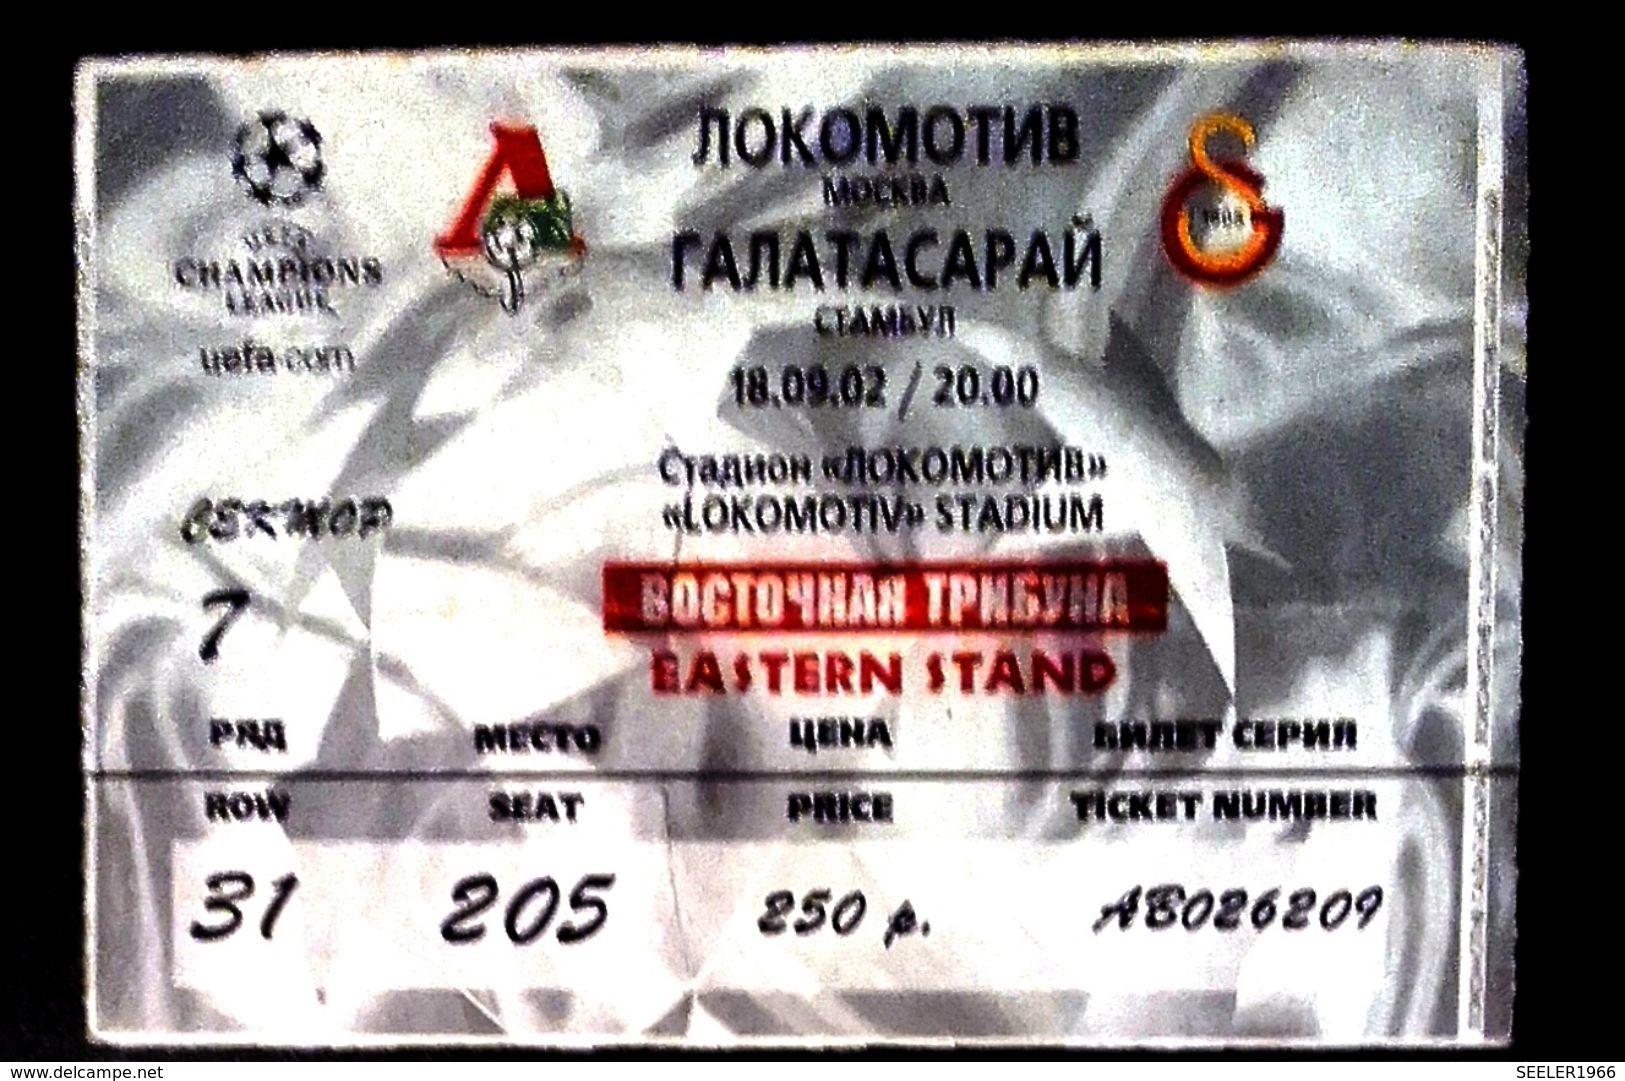 Football Tickets/billets - LOKOMOTIV Moscow V. GALATASARAY Istambul.  18. IX. 2002. UEFA CHAMPIONS League. - Tickets D'entrée